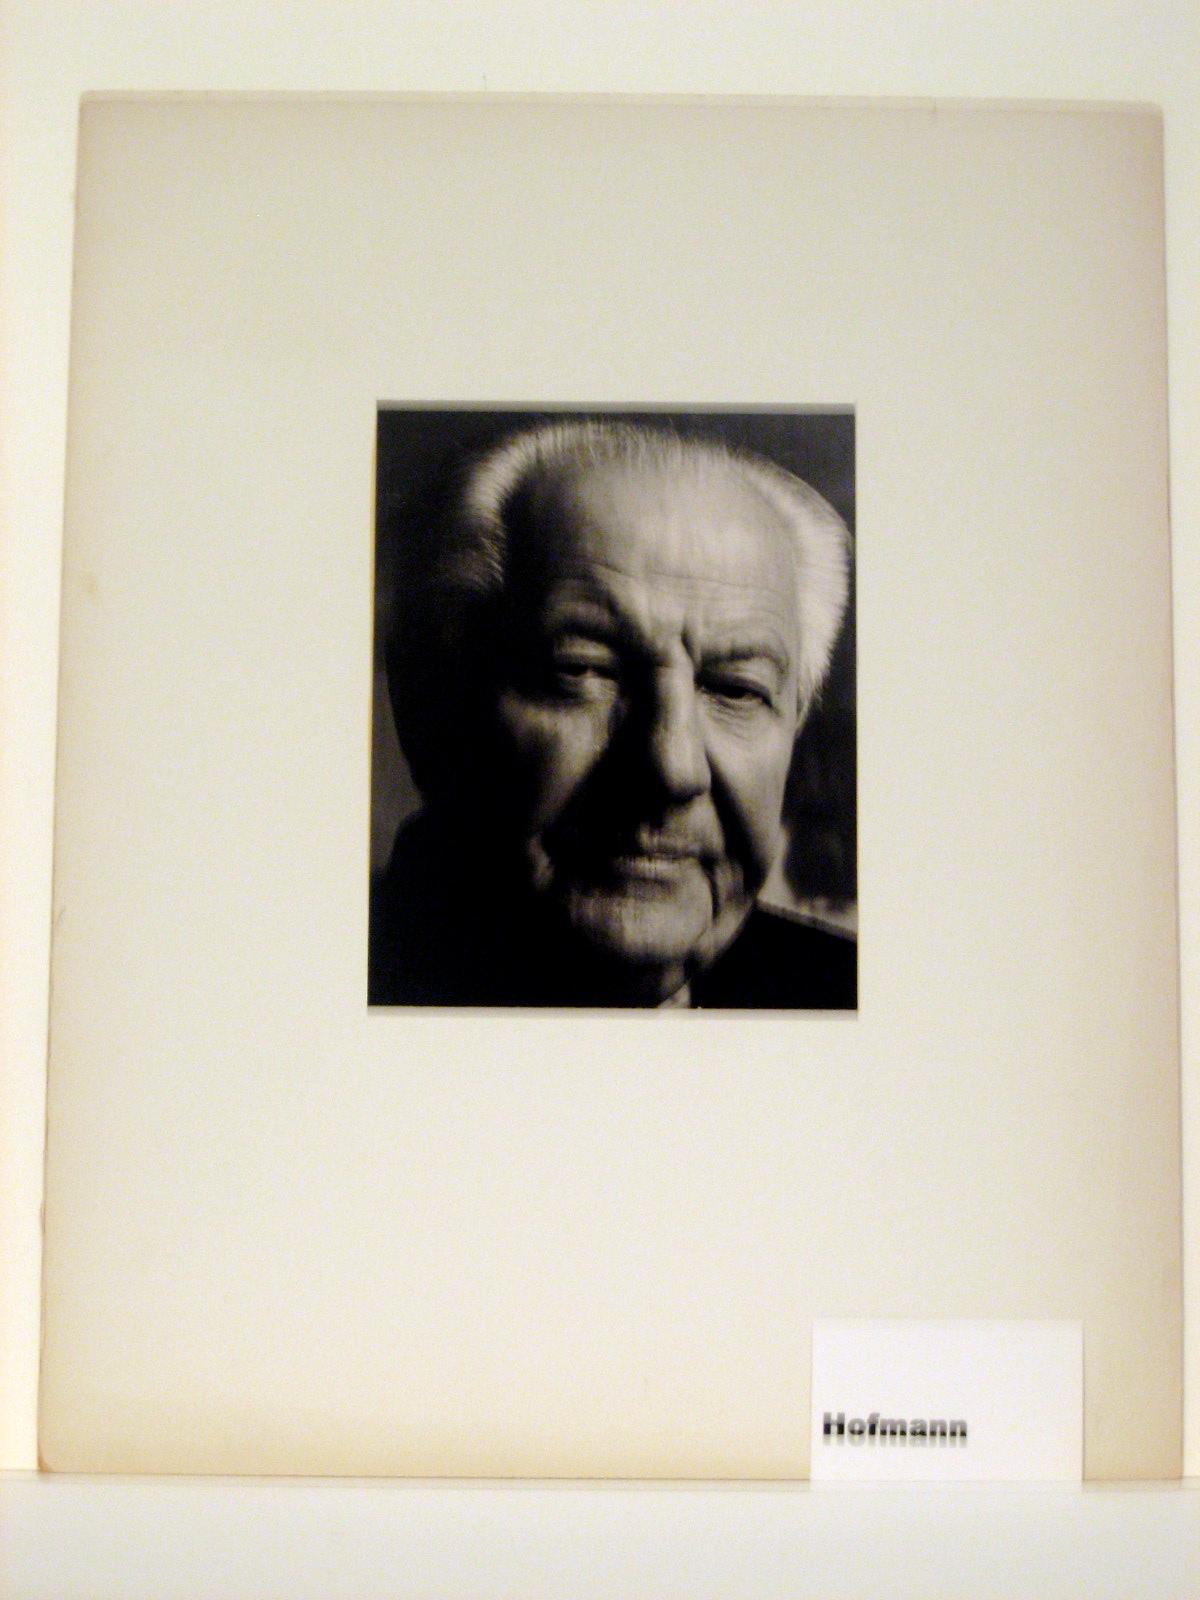 Hofmann 2.jpg